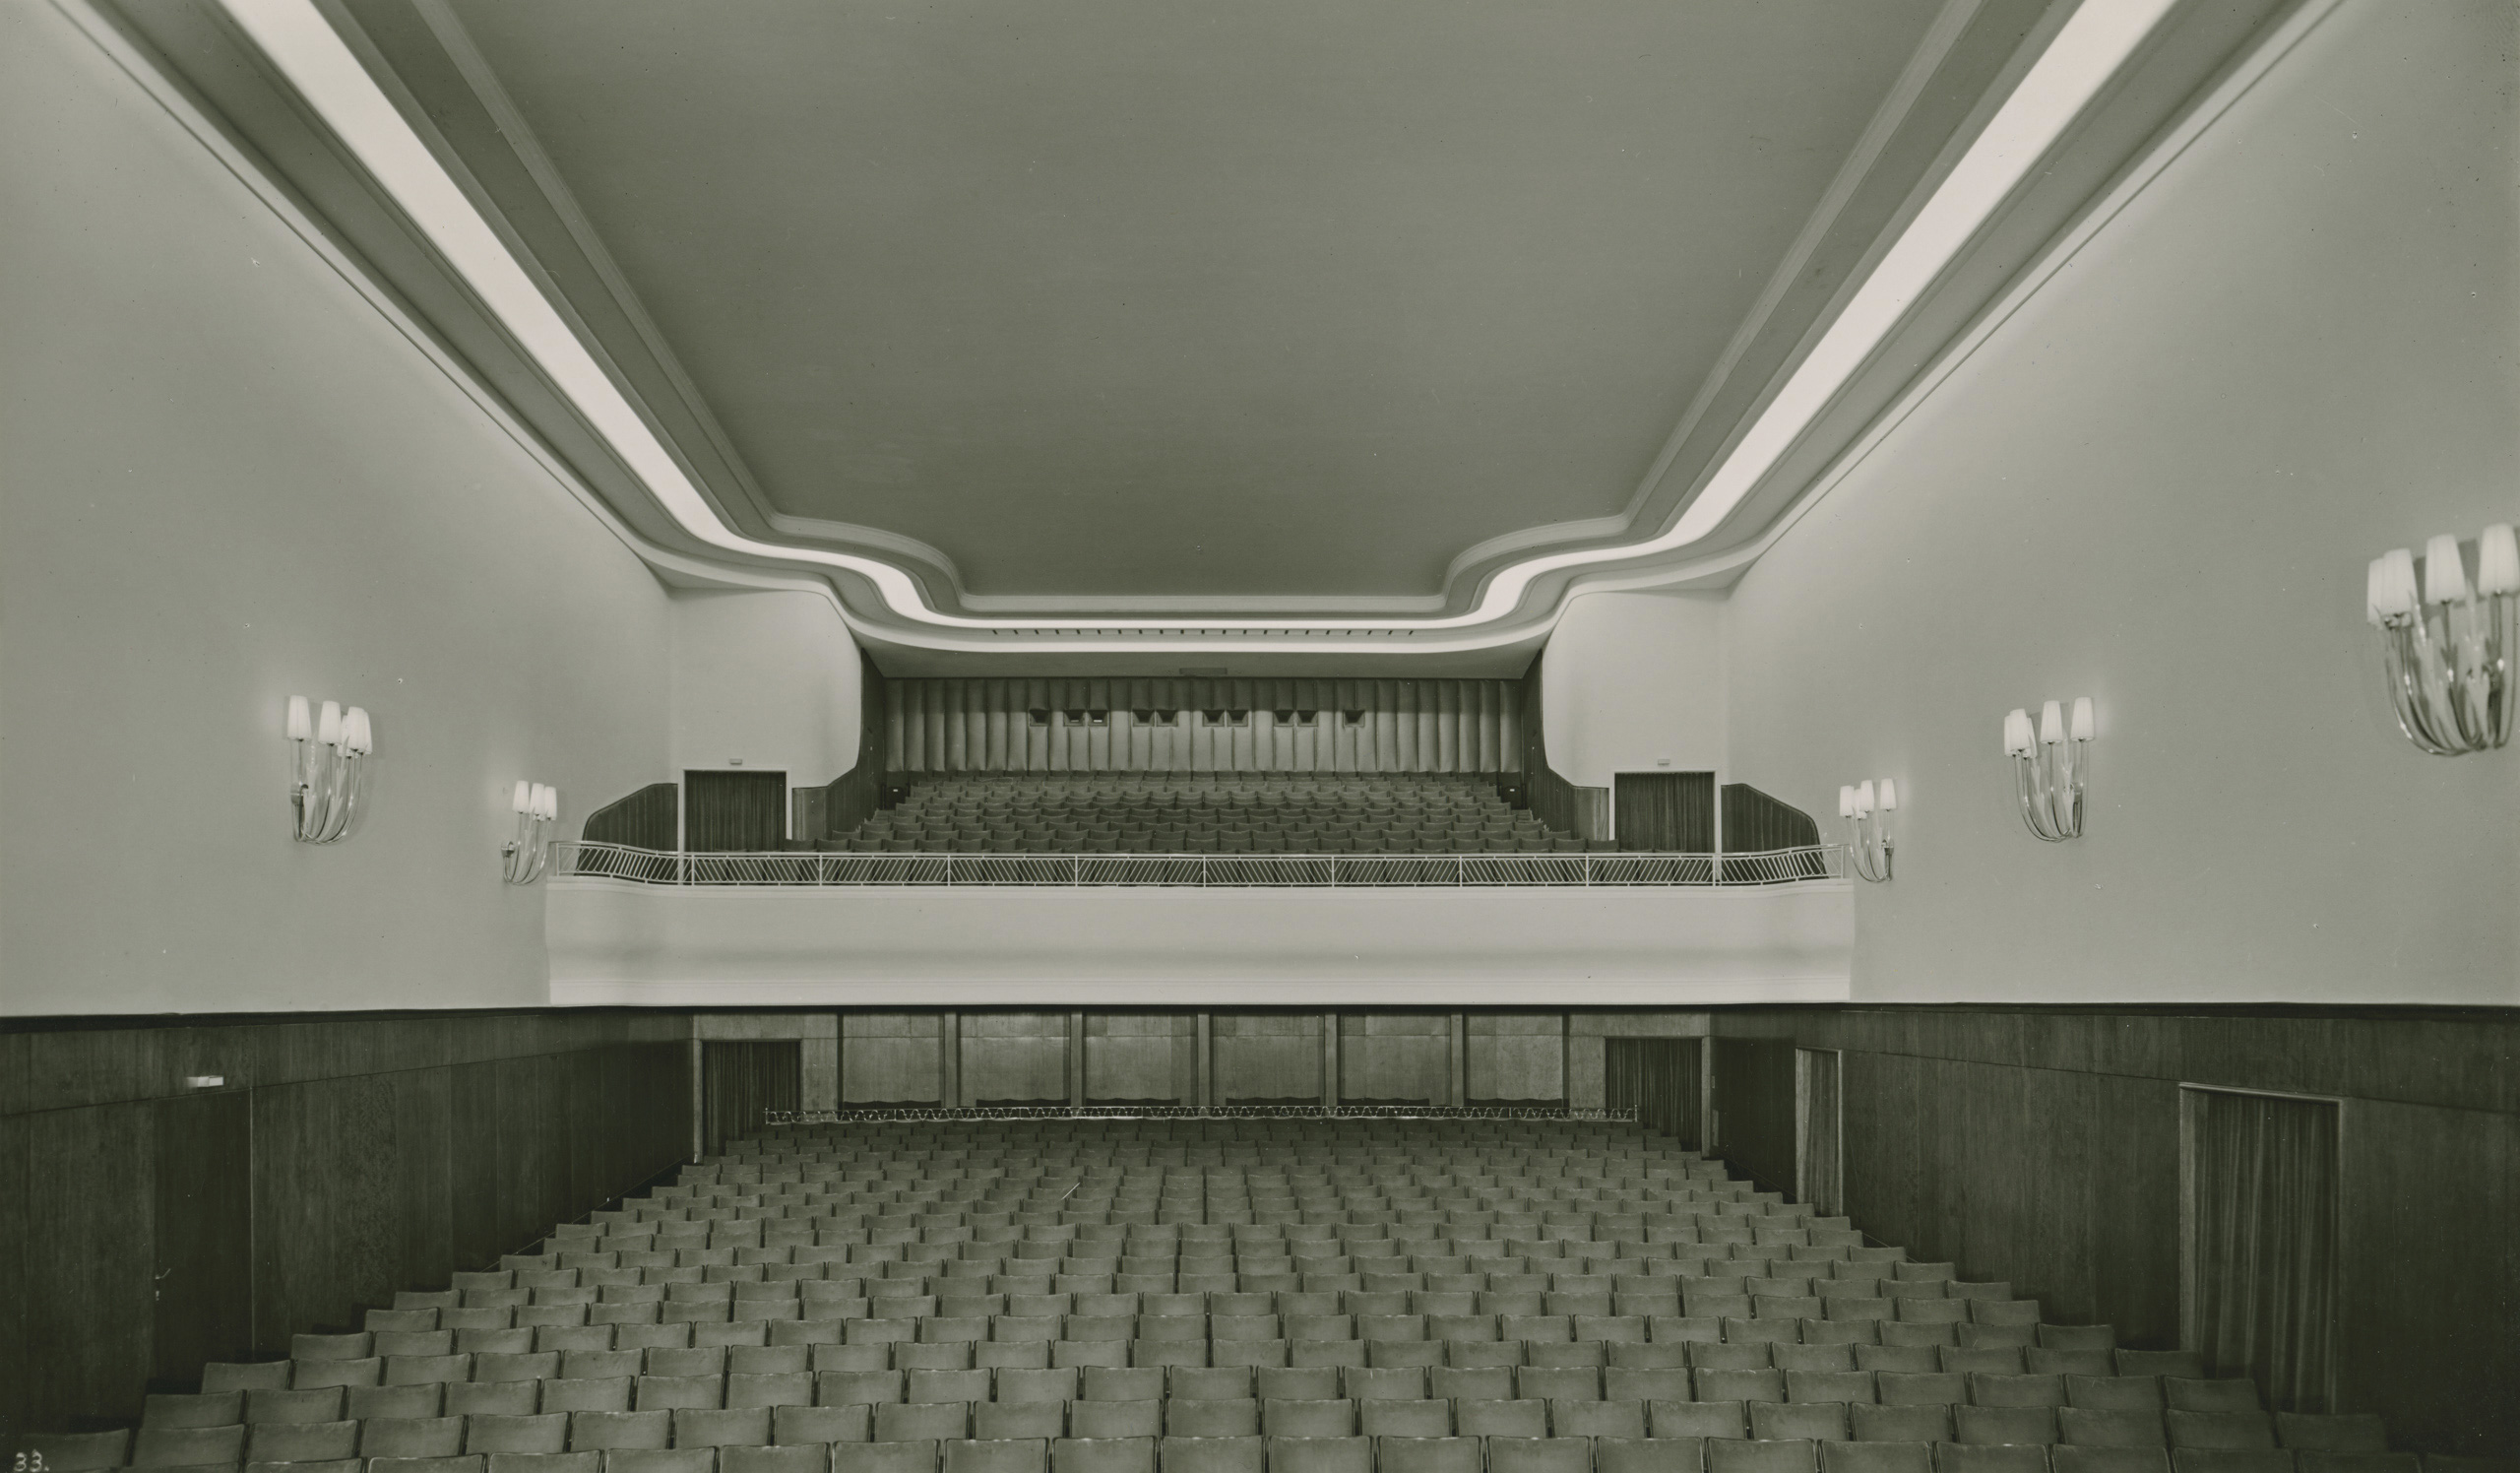 Black and white photo: the auditorium facing back